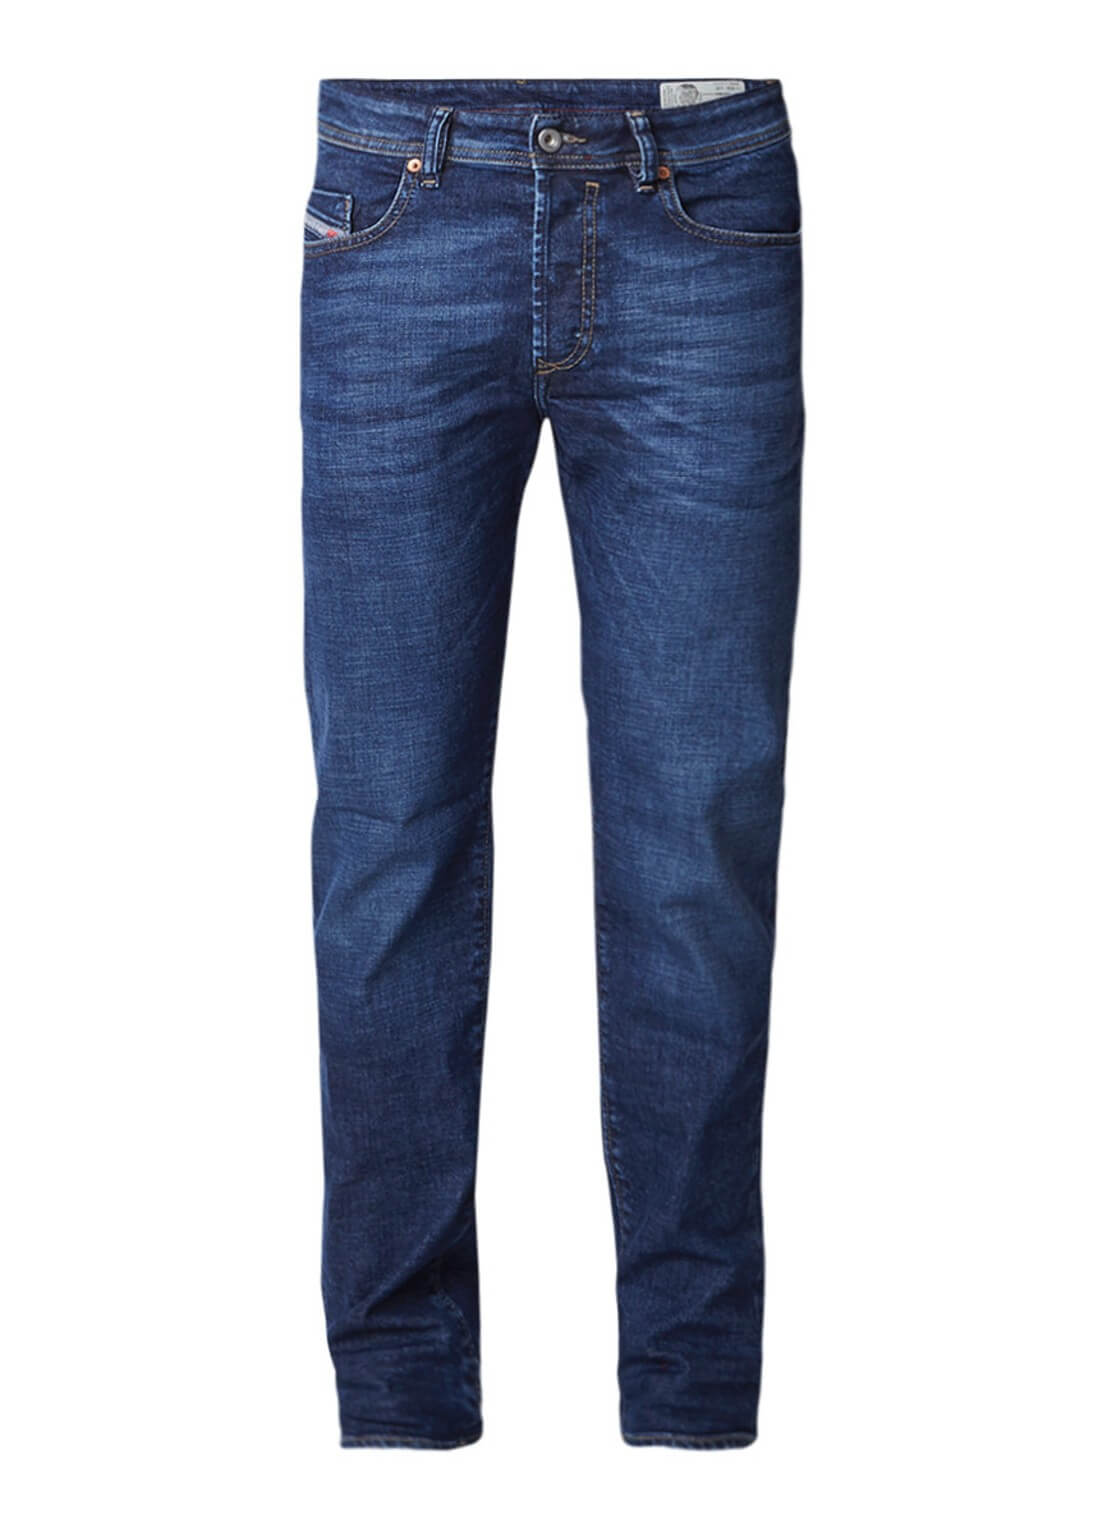 Jeans - Mr.Draper